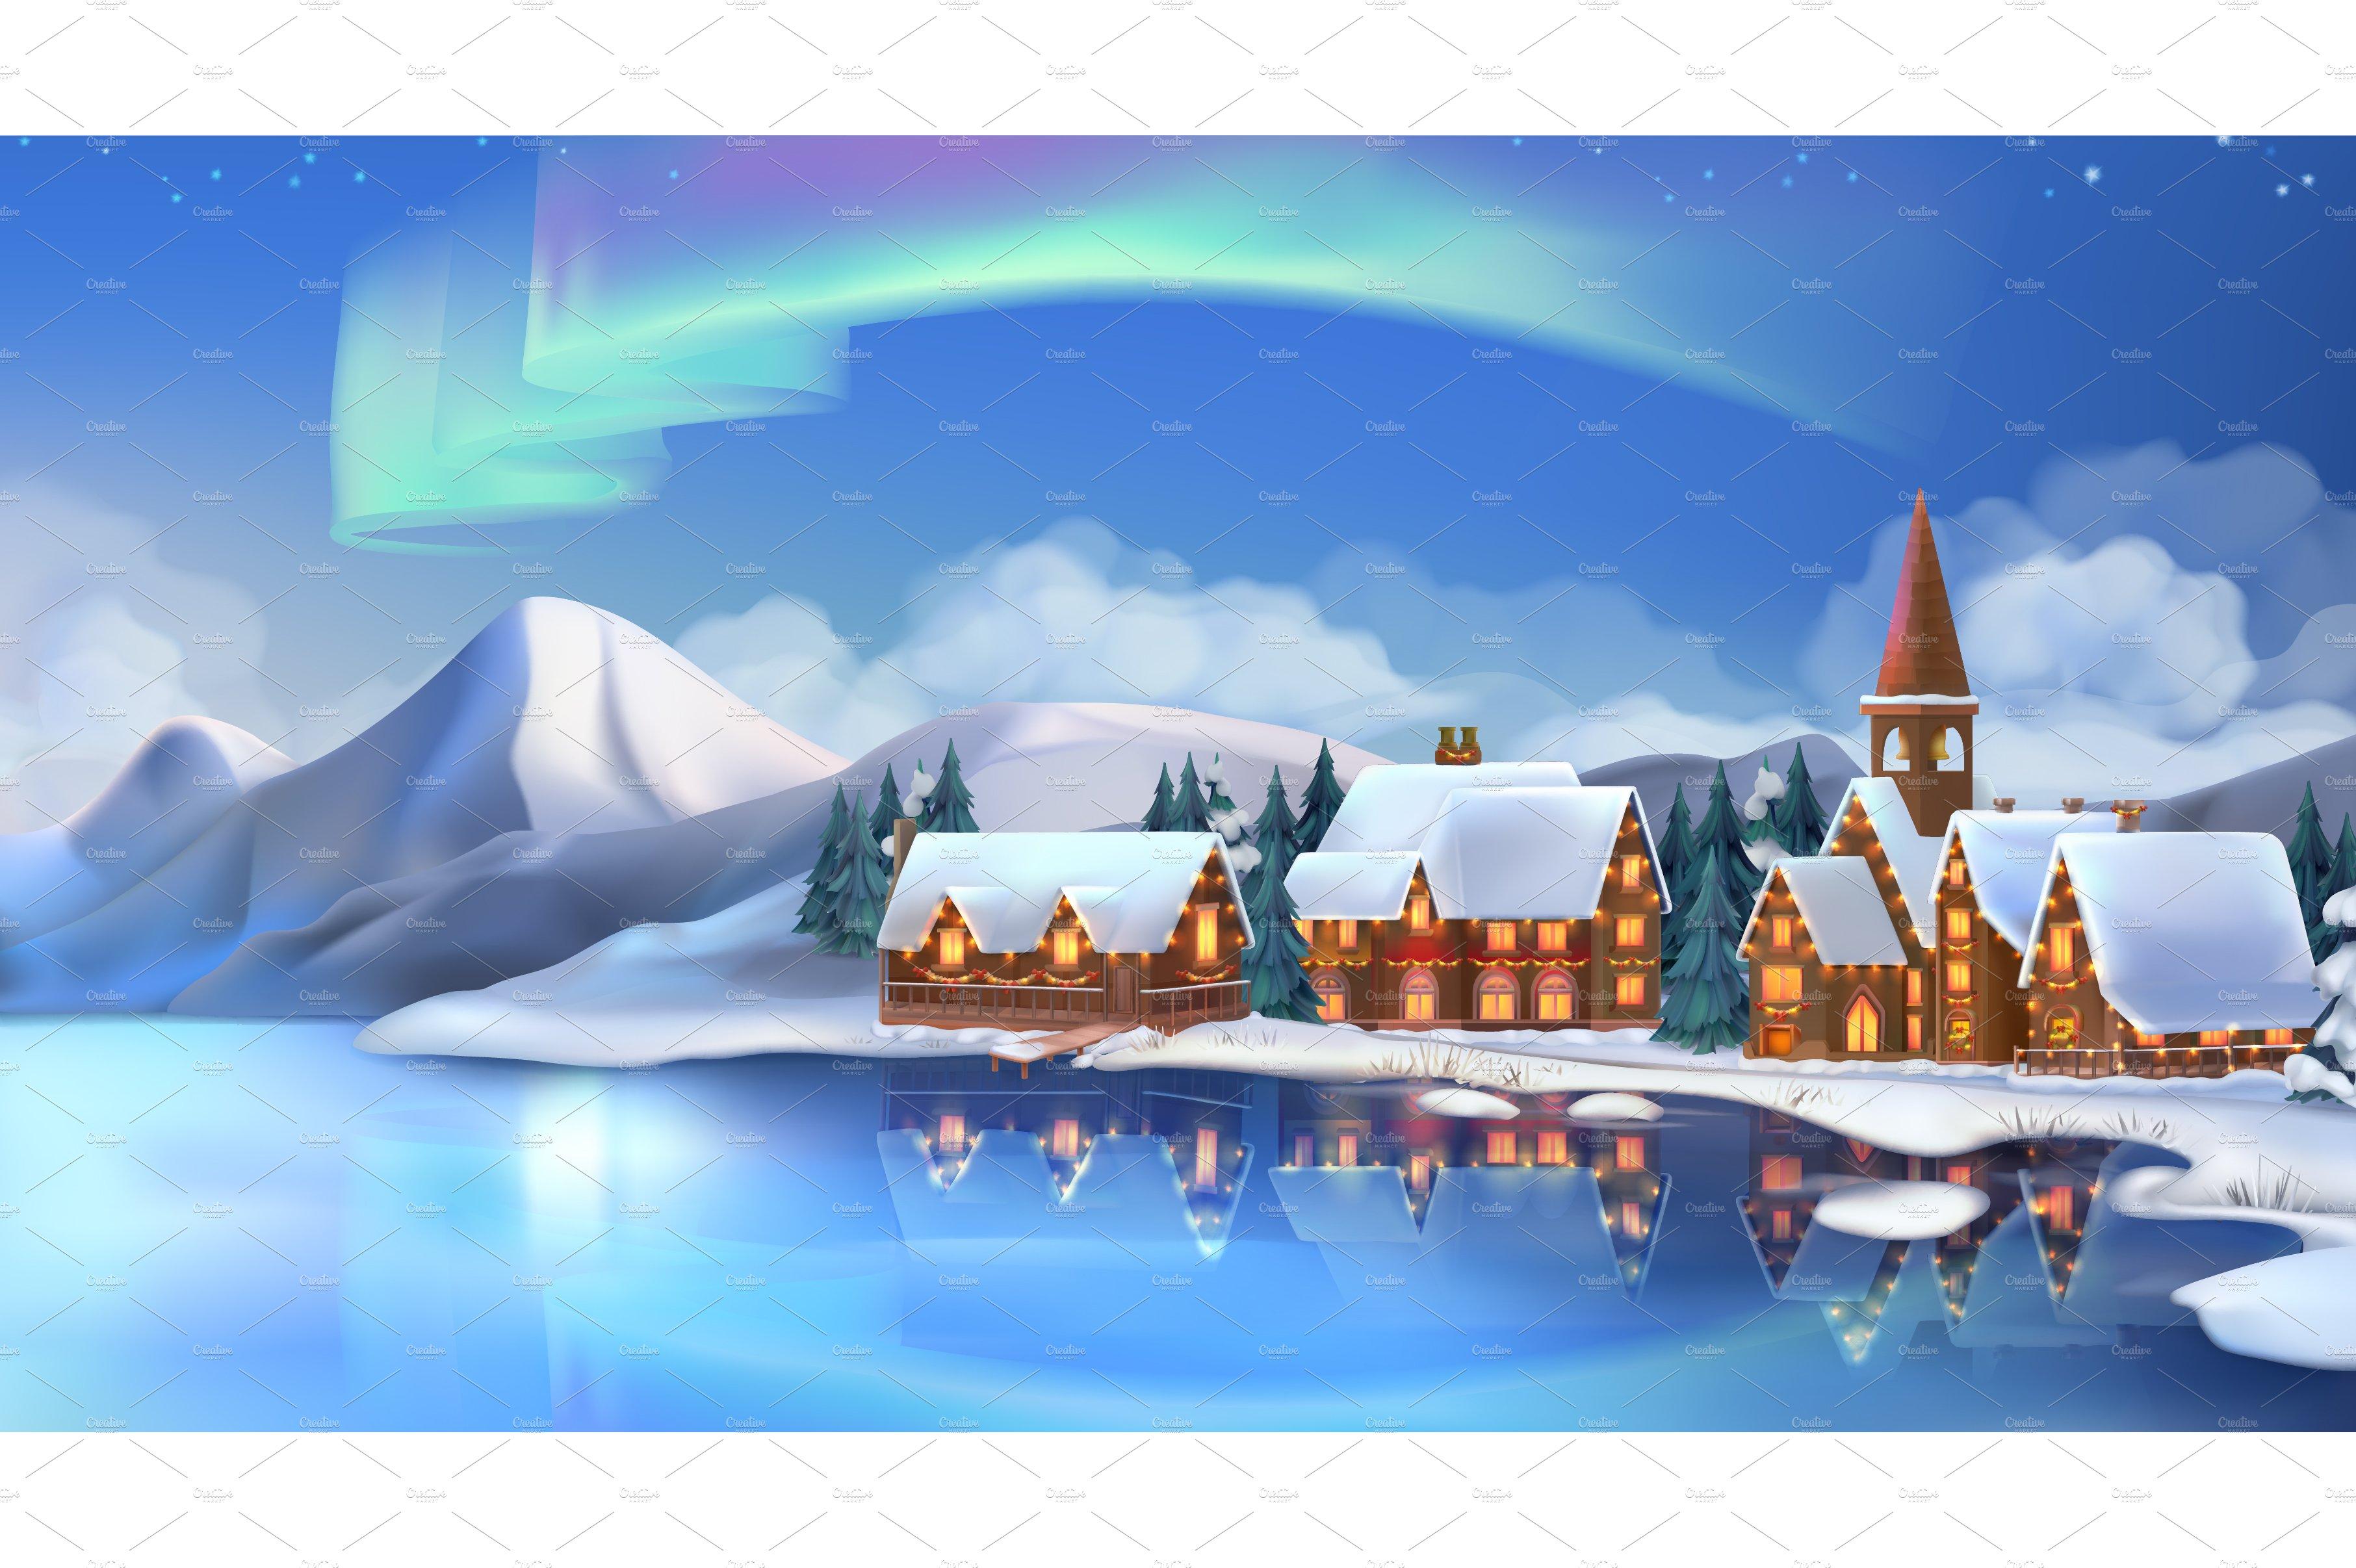 Landscape Illustration Vector Free: Winter Landscape New Year Background